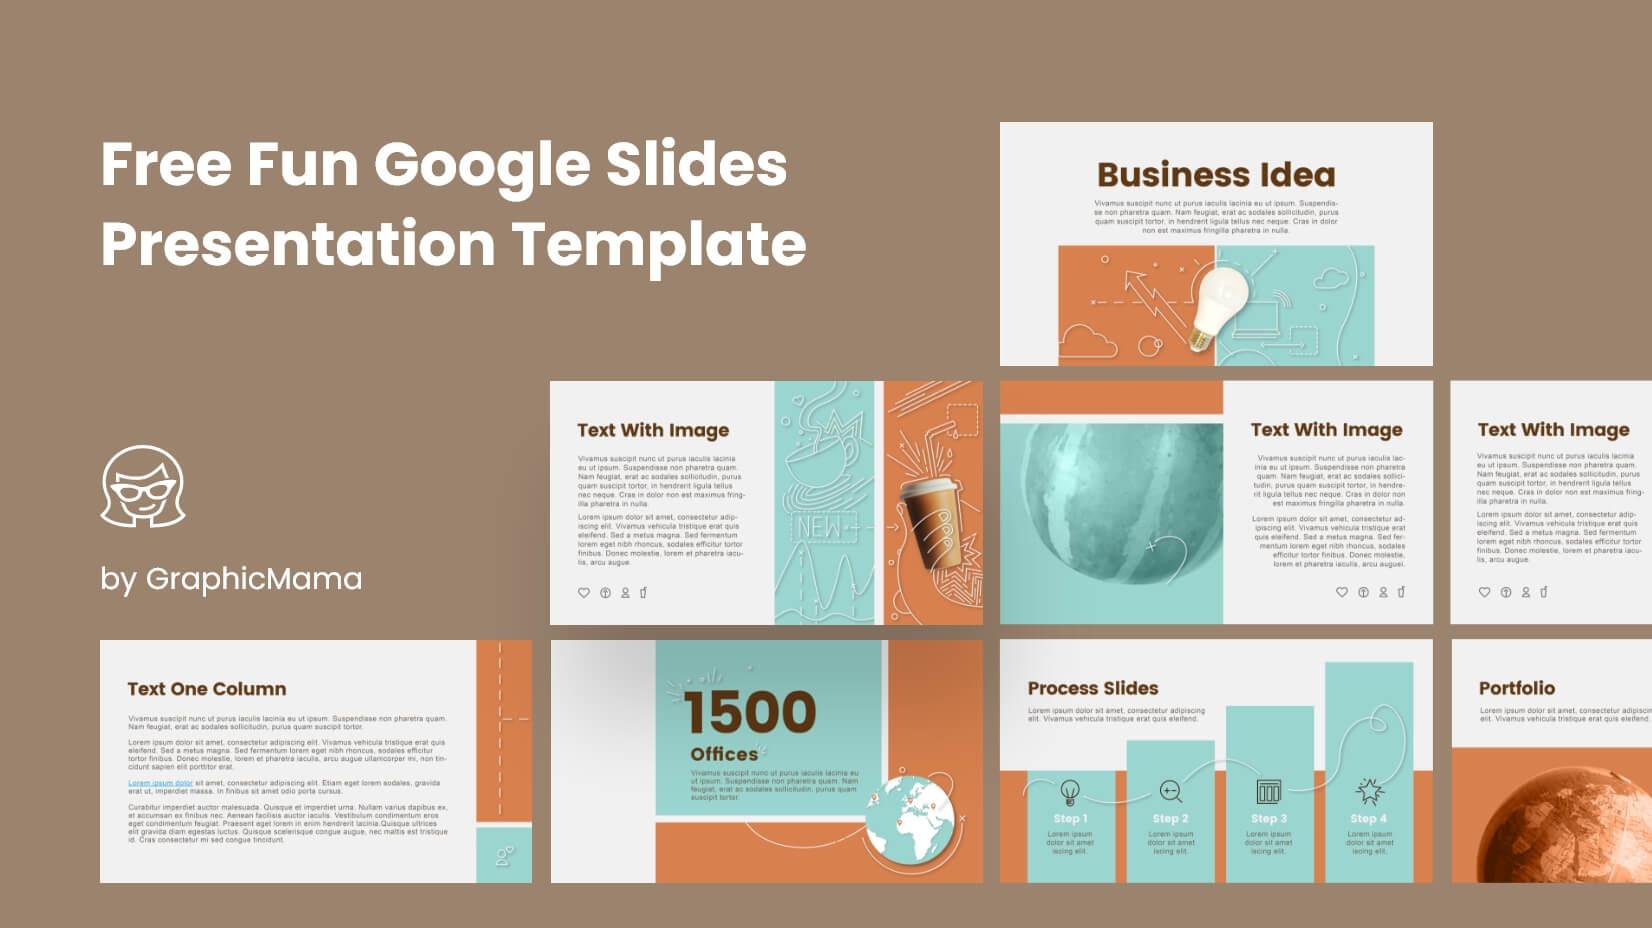 Free-Fun-Google-Slides-Presentation-Template.